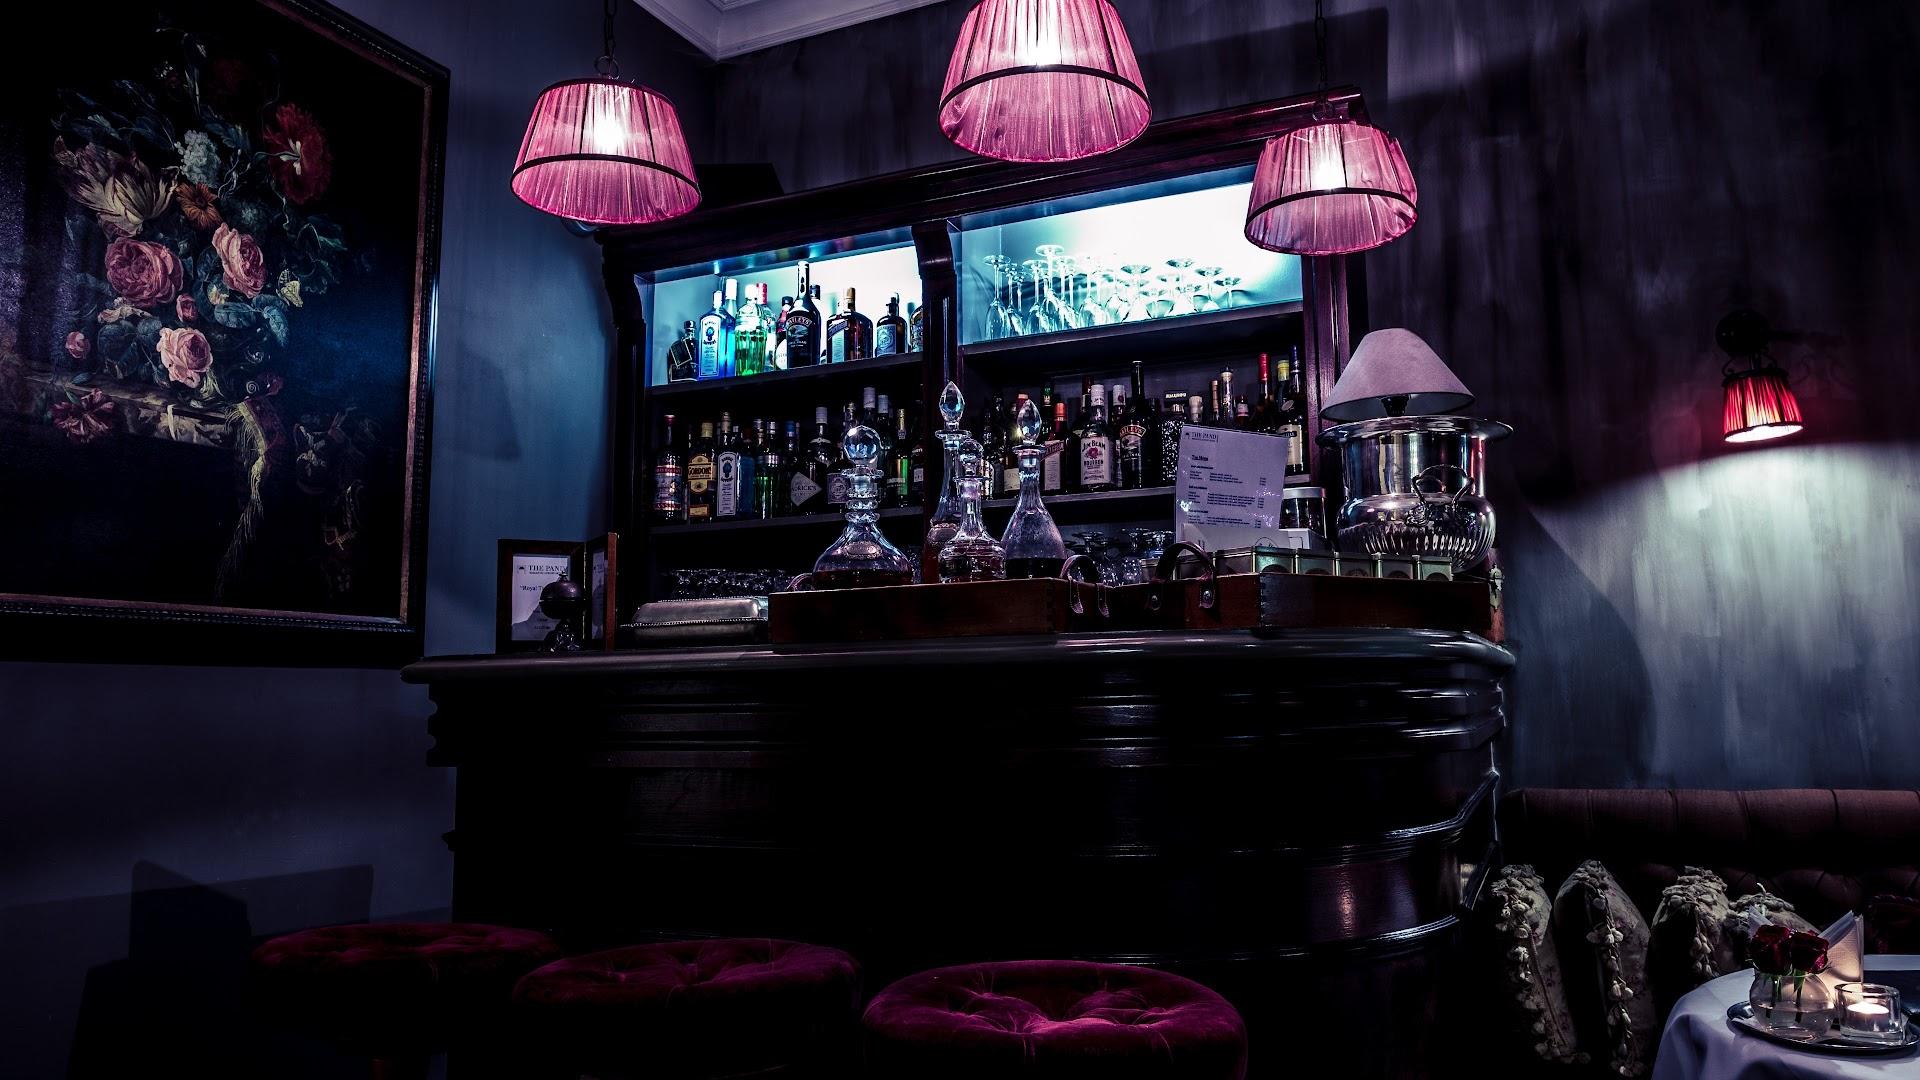 interior bar design wallpaper hd wallpapers